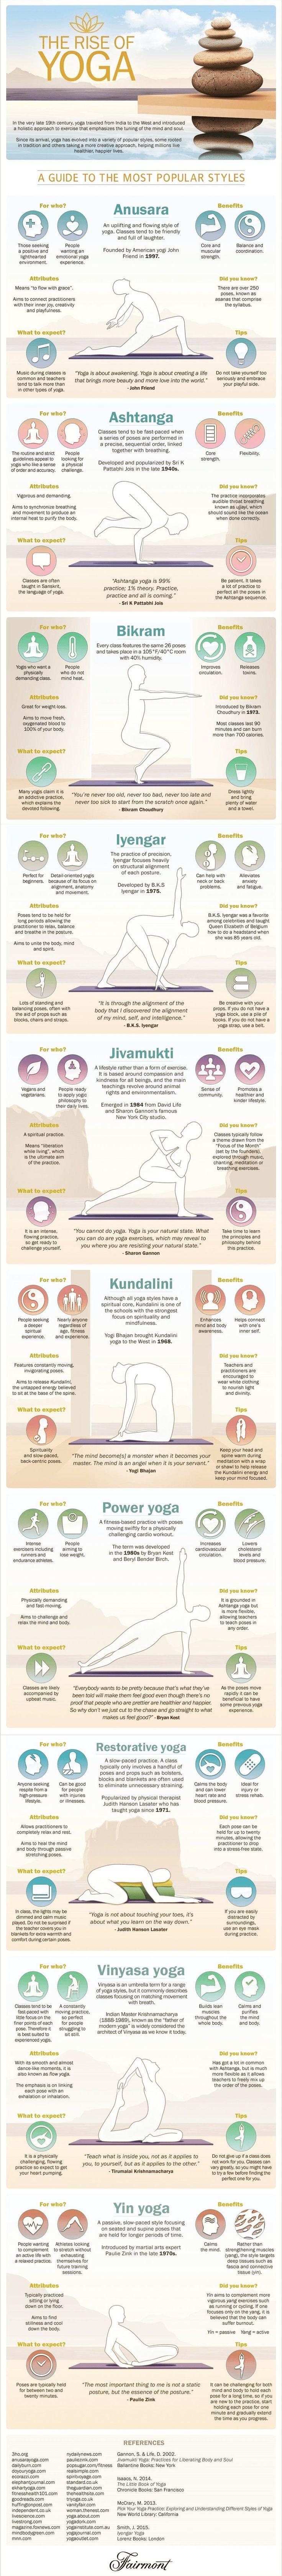 Most Popular Yoga Styles - Health Infographic. Topic: types of yoga, yogi, exercise, poses, postures, Anusara, Ashtanga, Bikram, Kripalu, Hatha, Iyengar, Kundalini, Jivamukti, Prenatal, Restorative, Sivananda, Viniyoga, Yin, Power yoga. https://www.pinter http://www.yogaweightloss.net/best-yoga-position/